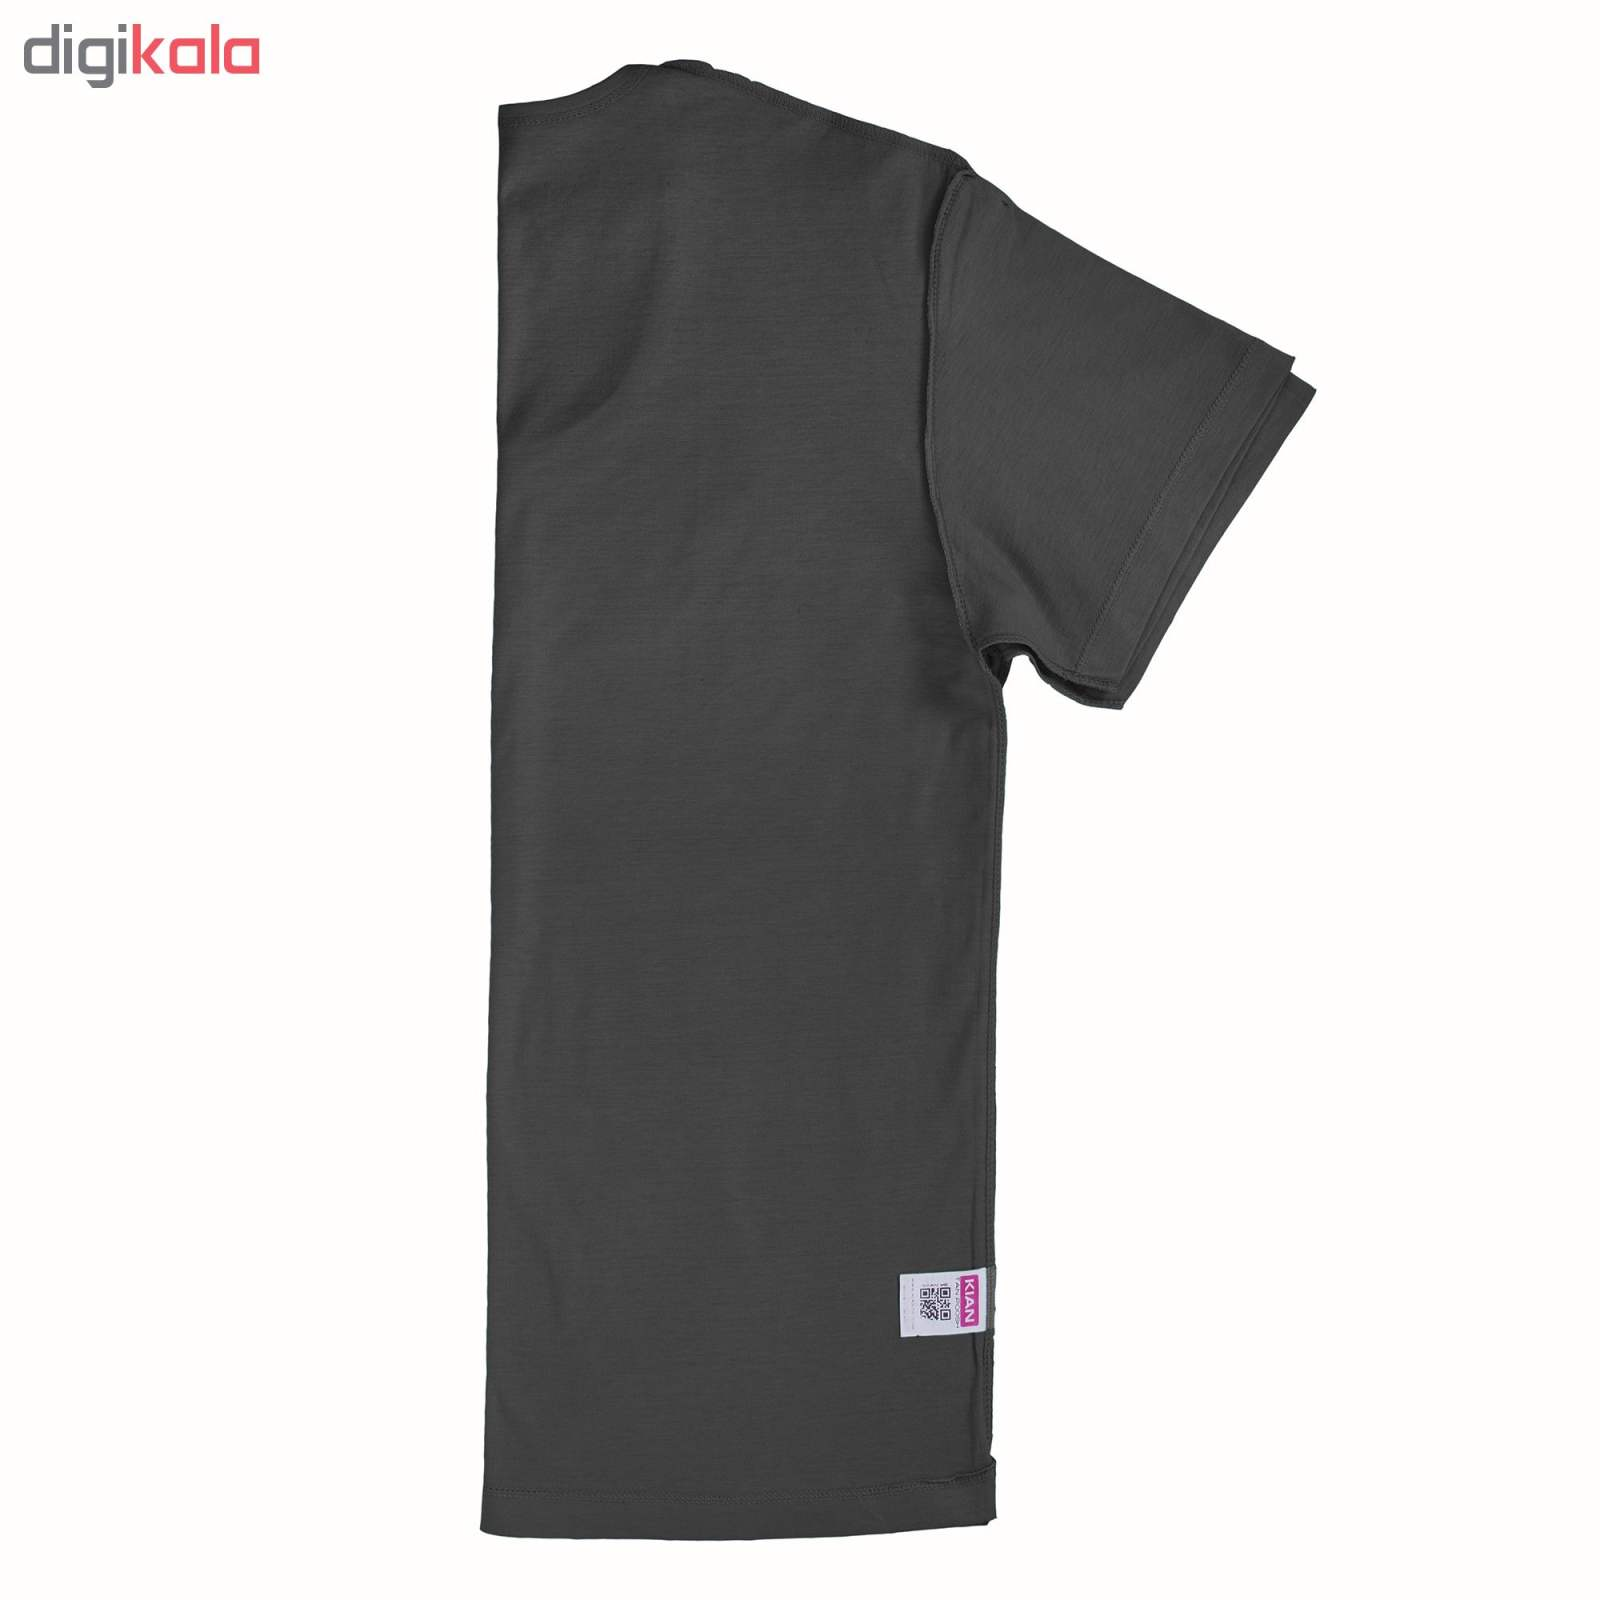 زیرپوش مردانه کیان تن پوش مدل U Neck Shirt Classic LG main 1 2